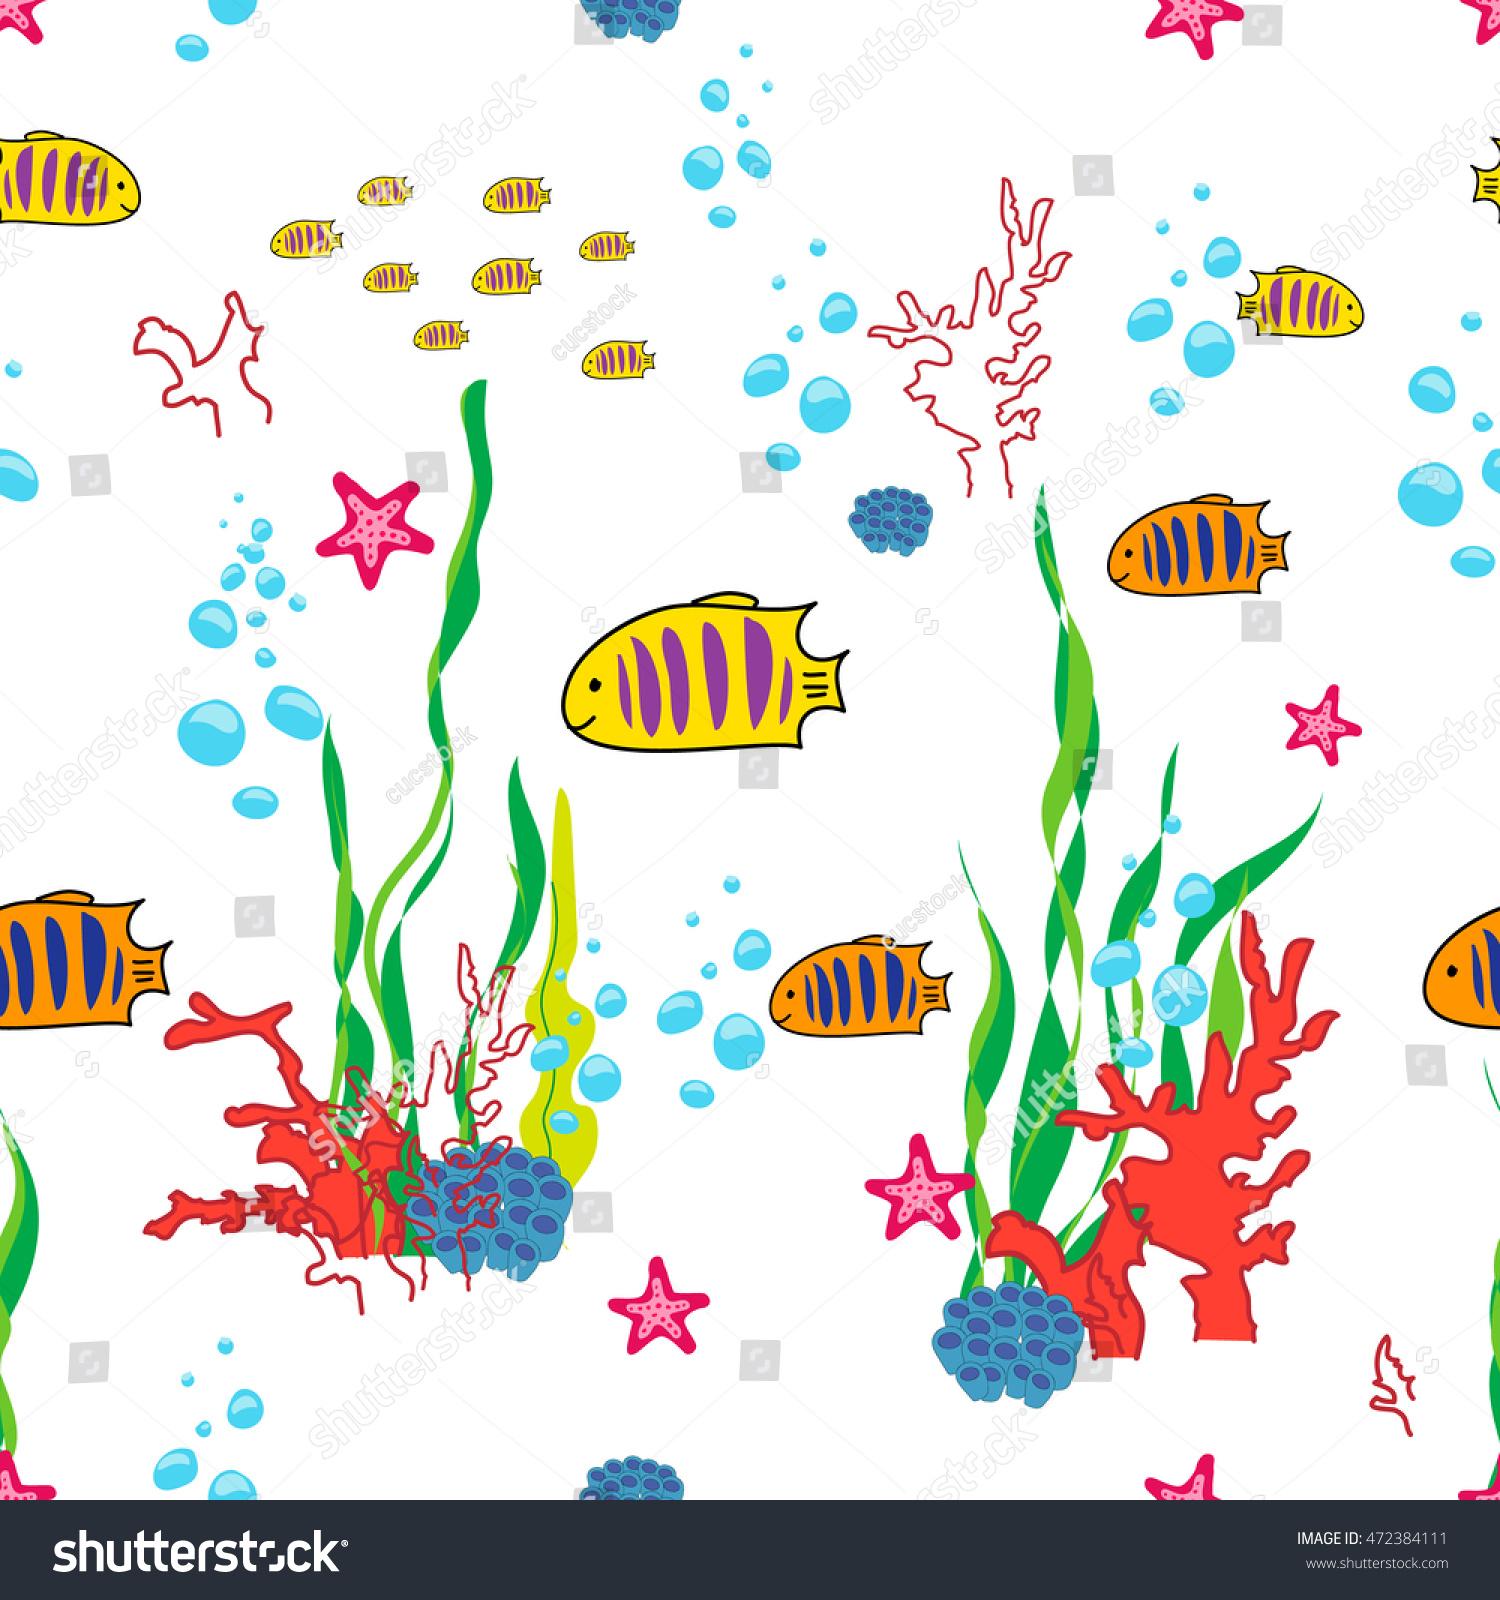 sea life cartoon fish ocean inhabitants stock illustration